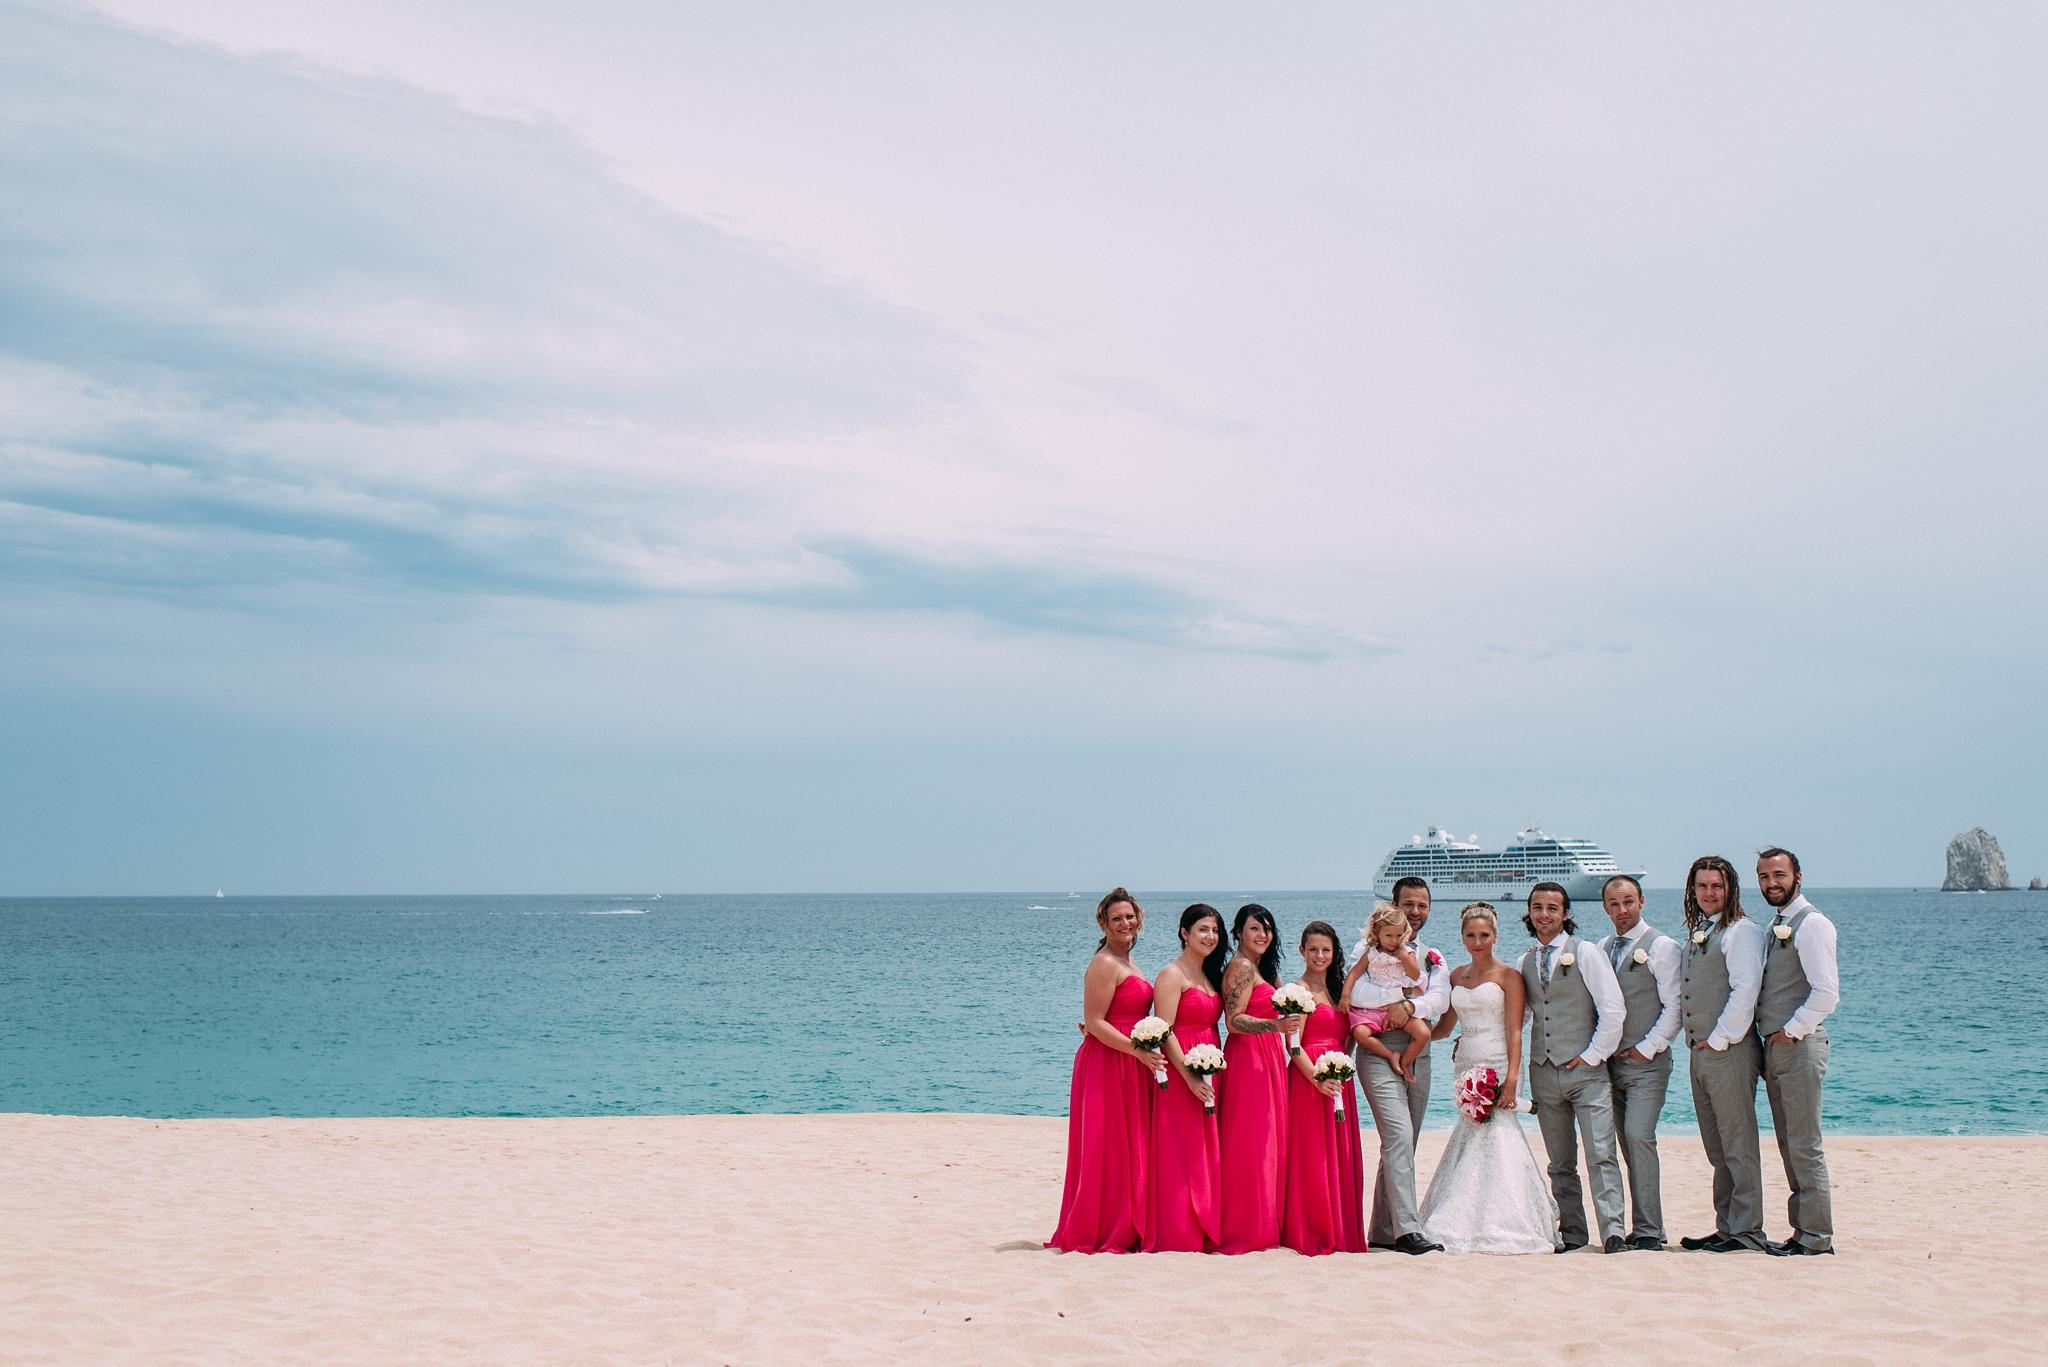 kaihla_tonai_intimate_wedding_elopement_photographer_1367